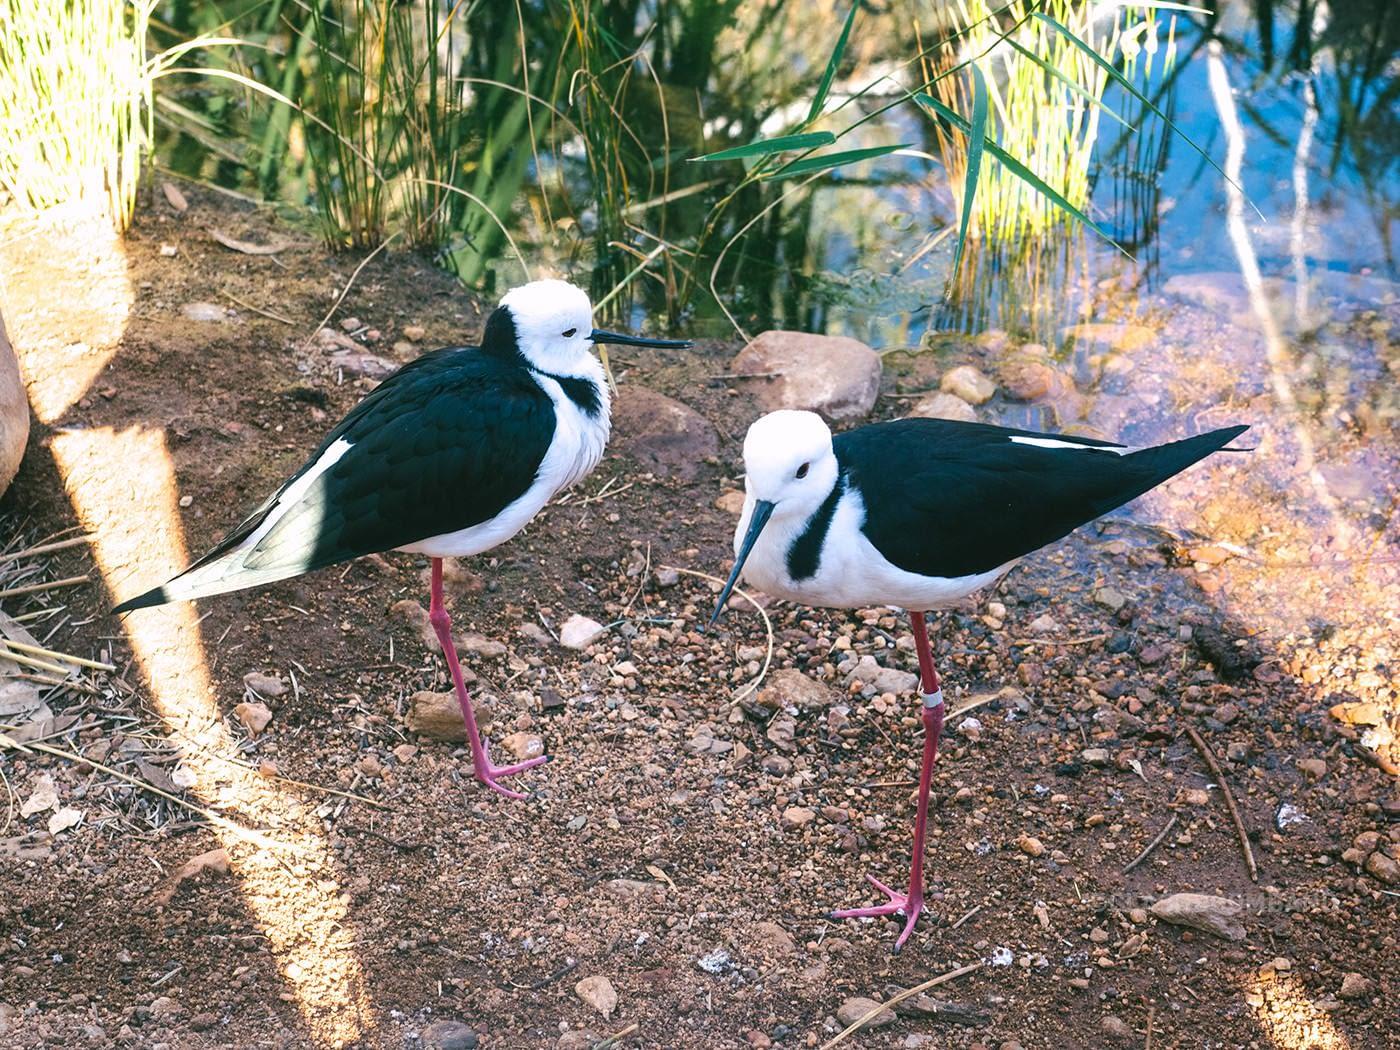 NT Australia - Pink leg birds